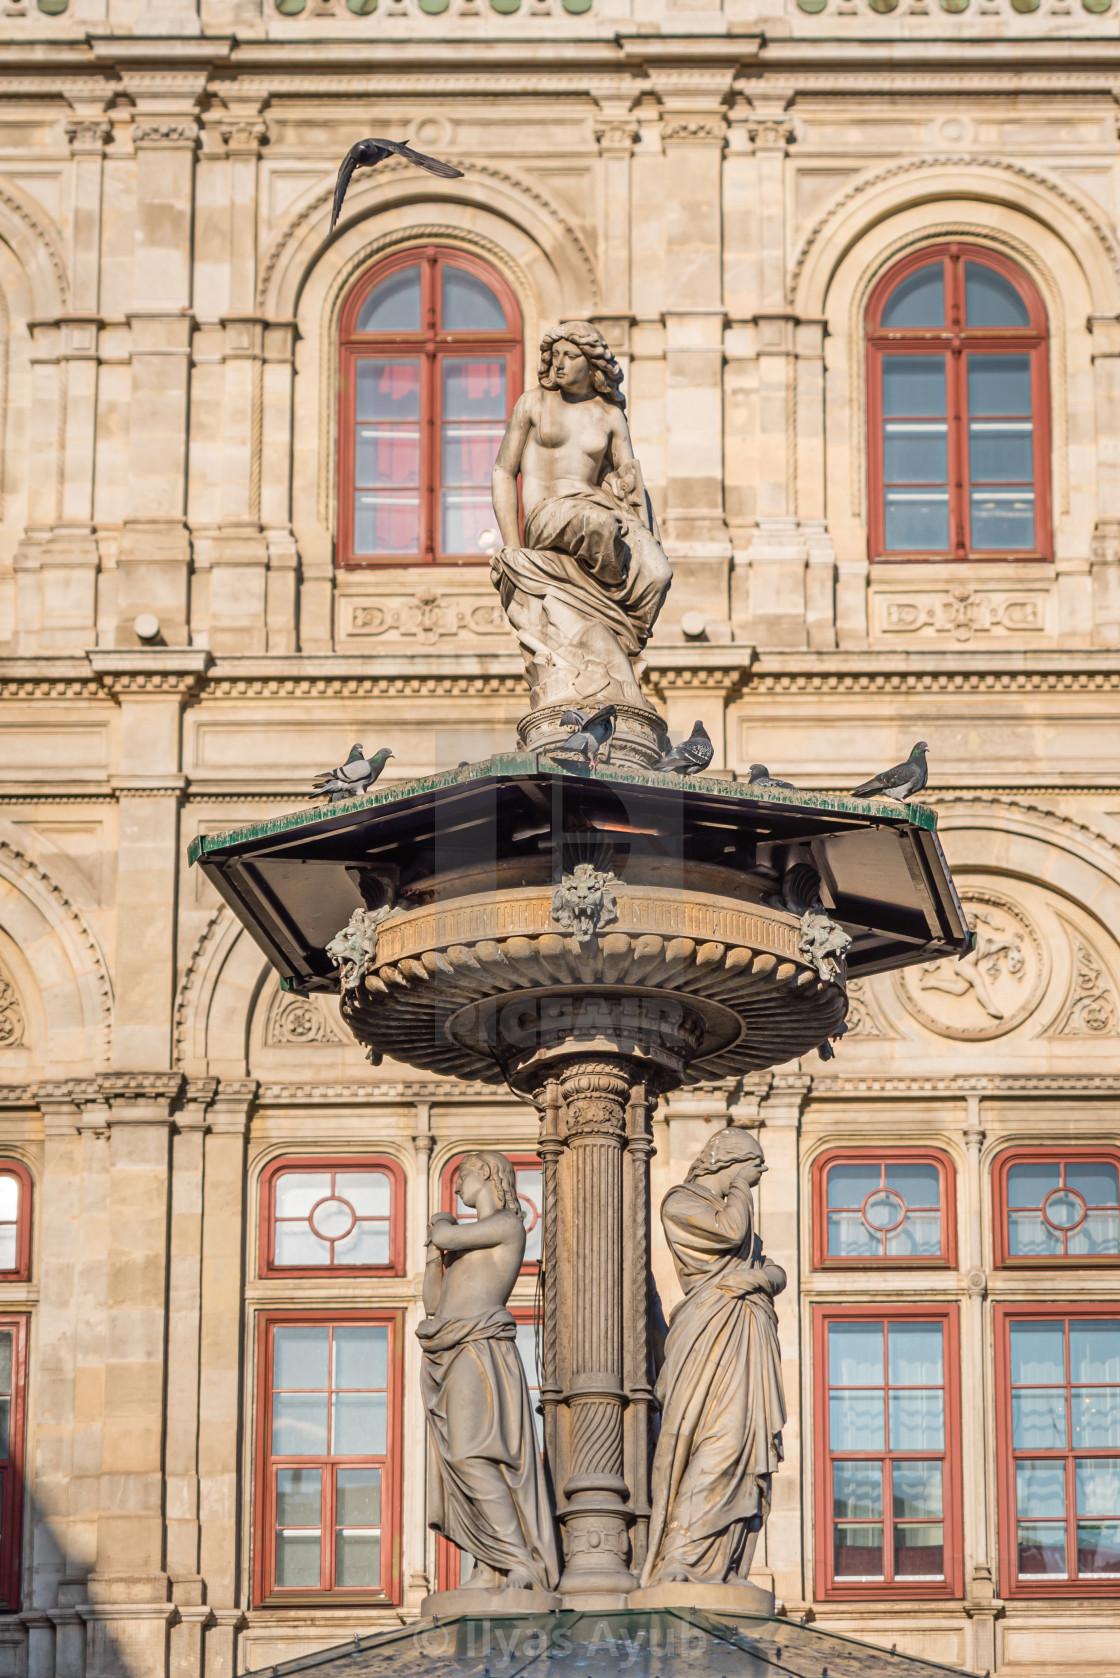 """Outside the Vienna Opera House (Wiener Staatsoper), Austria"" stock image"